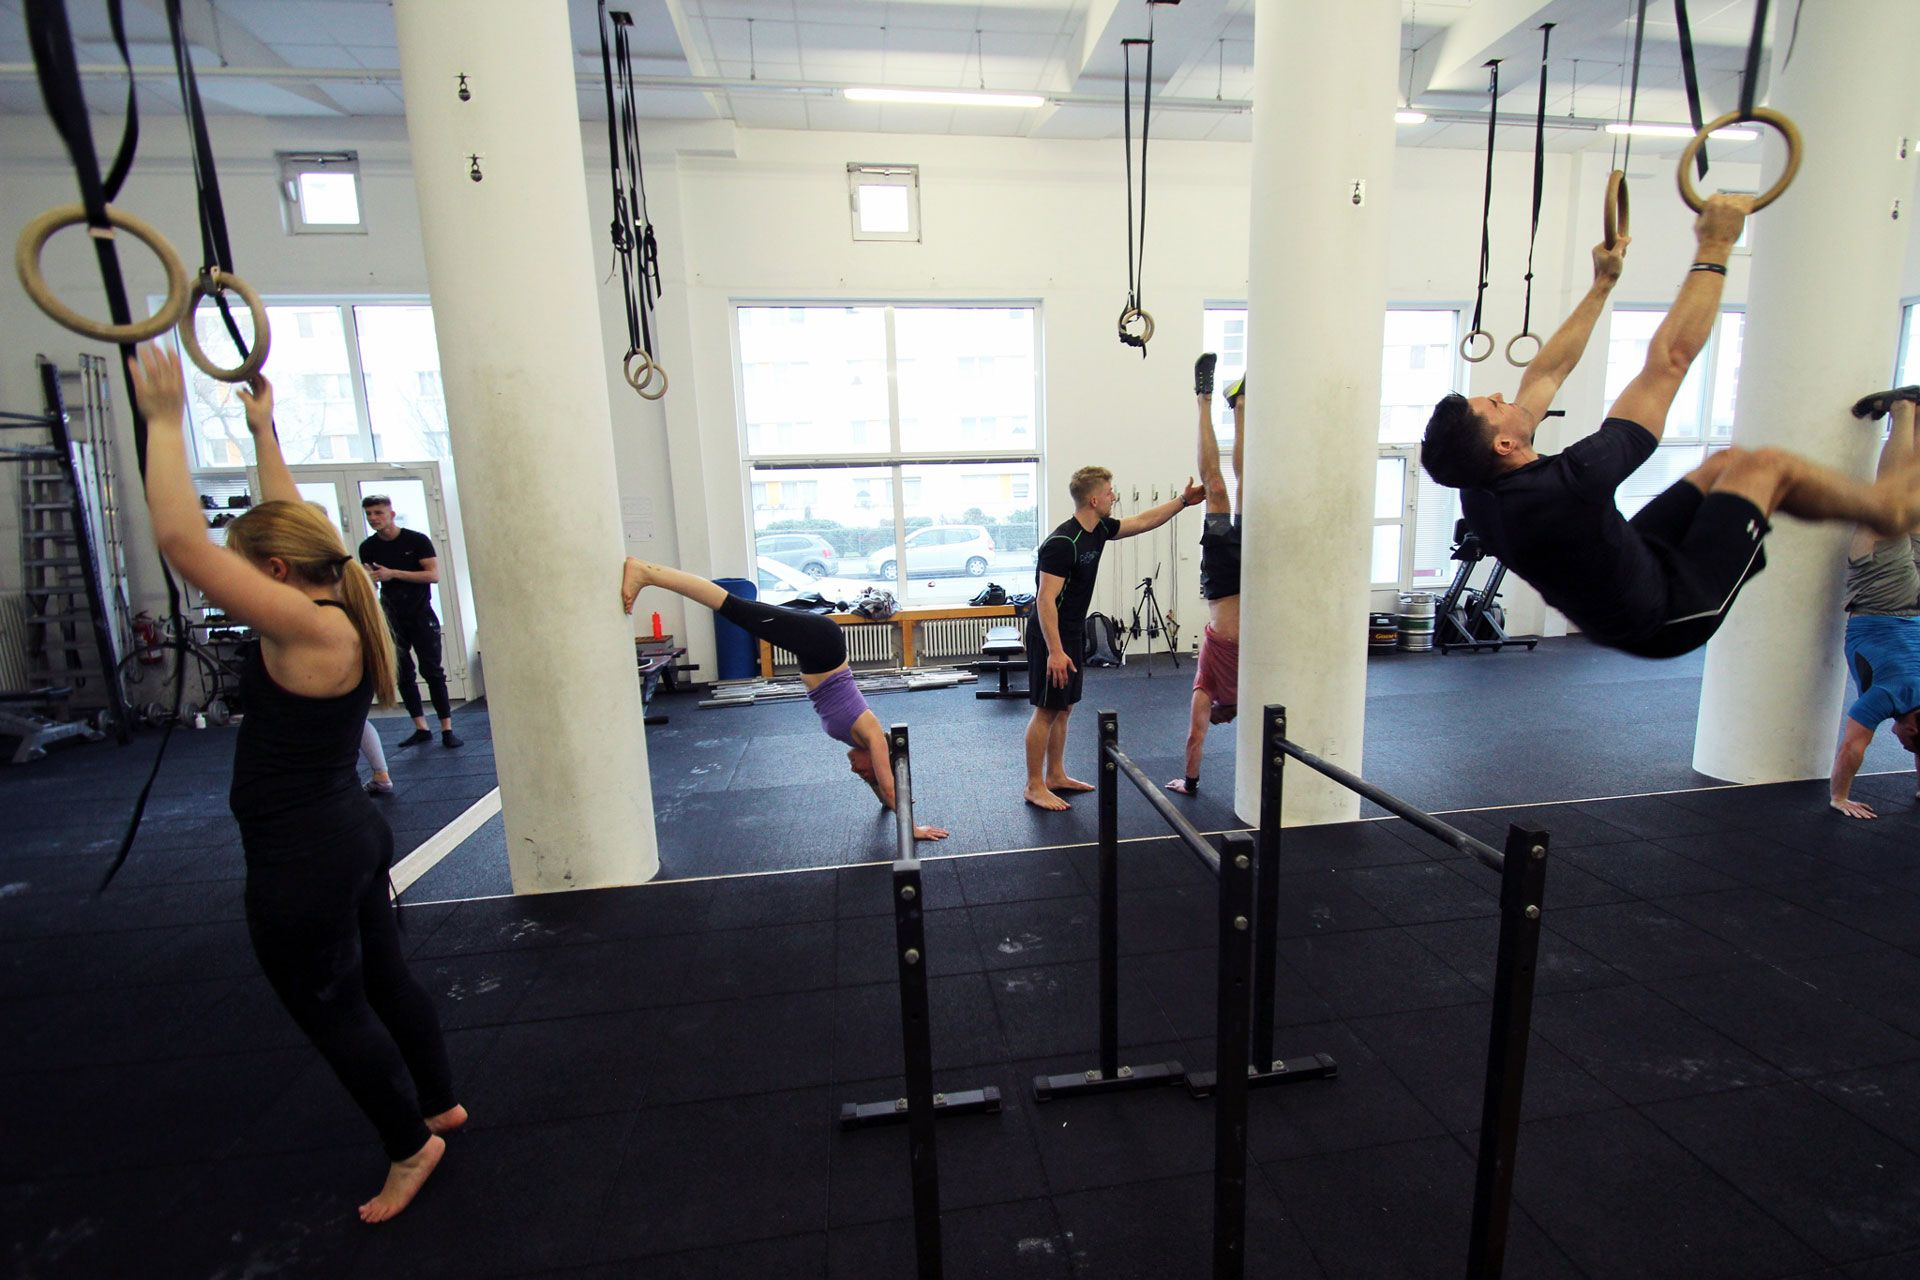 HOC Calisthenics Workshops, Pull-Ups, Push-Ups, Handstand